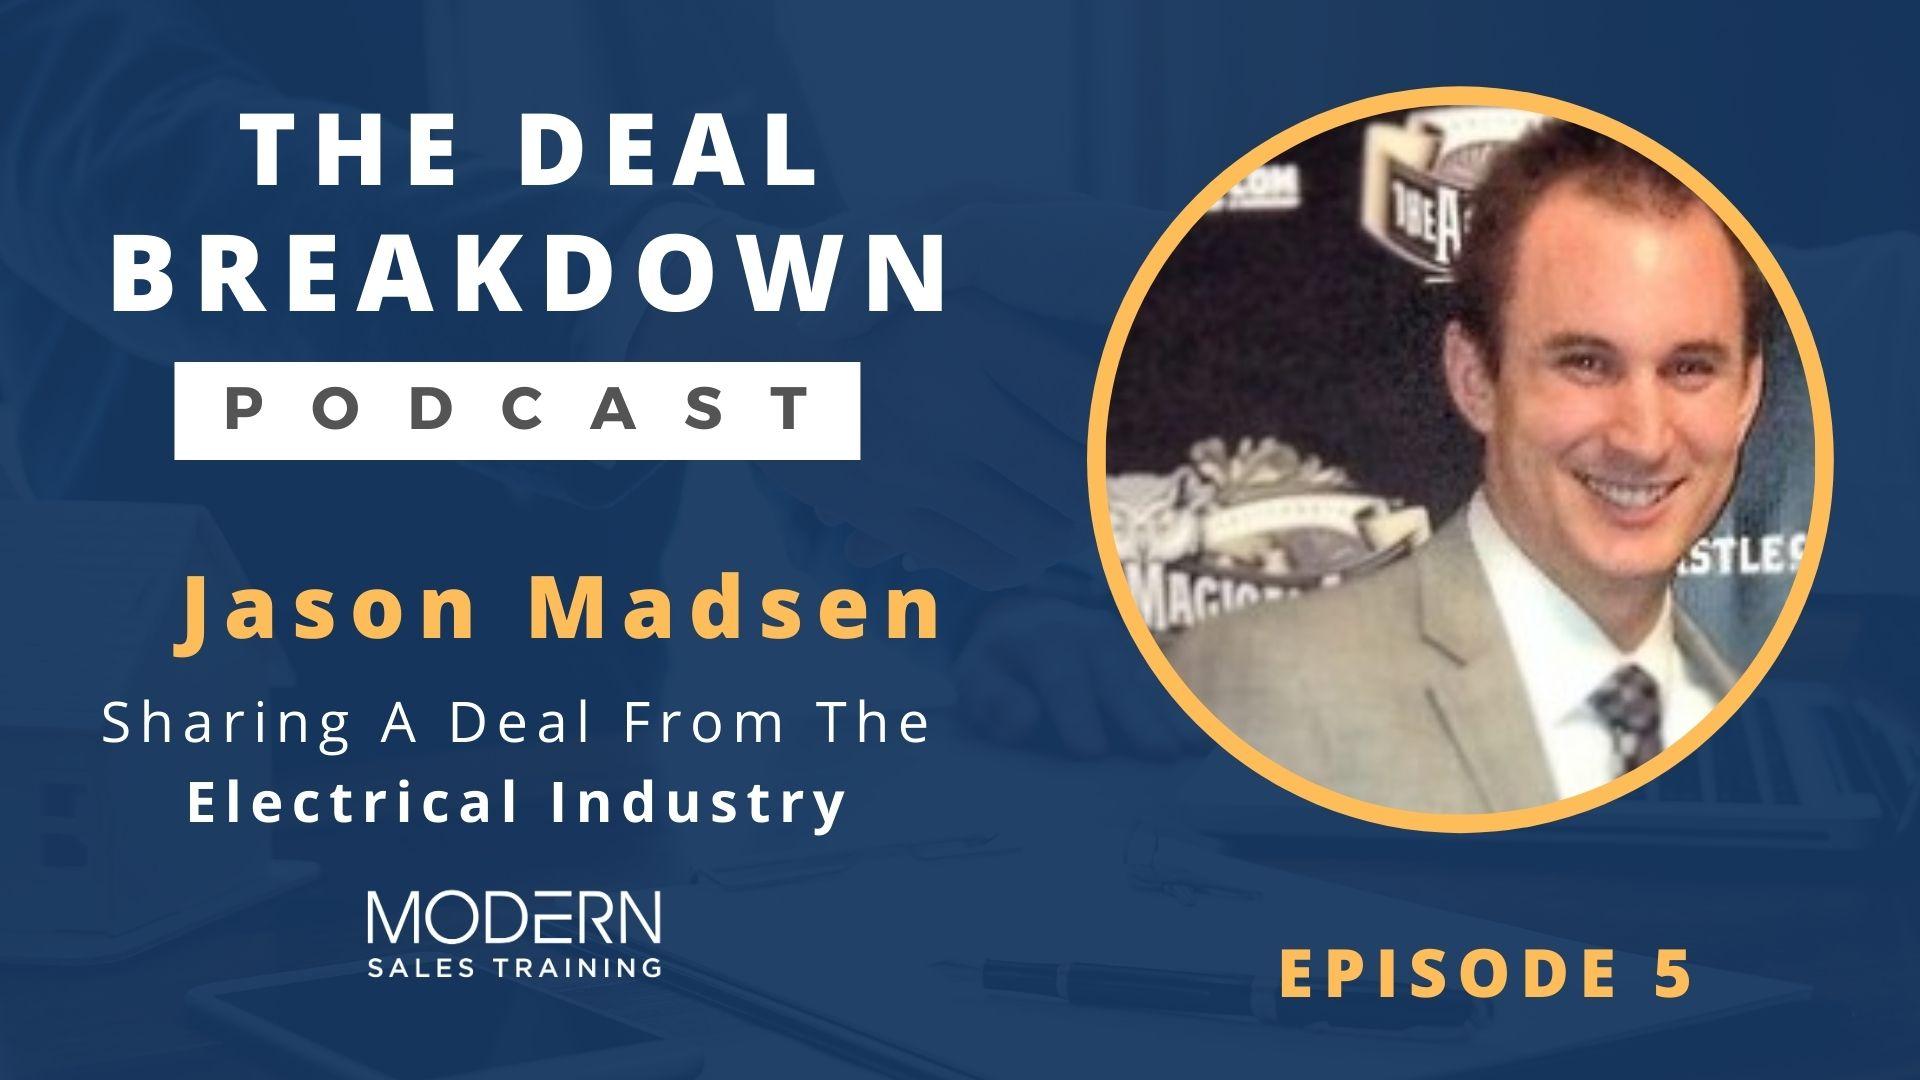 The-Deal-Breakdown-Podcast-Modern-Sales-Training-Jason-Madsen